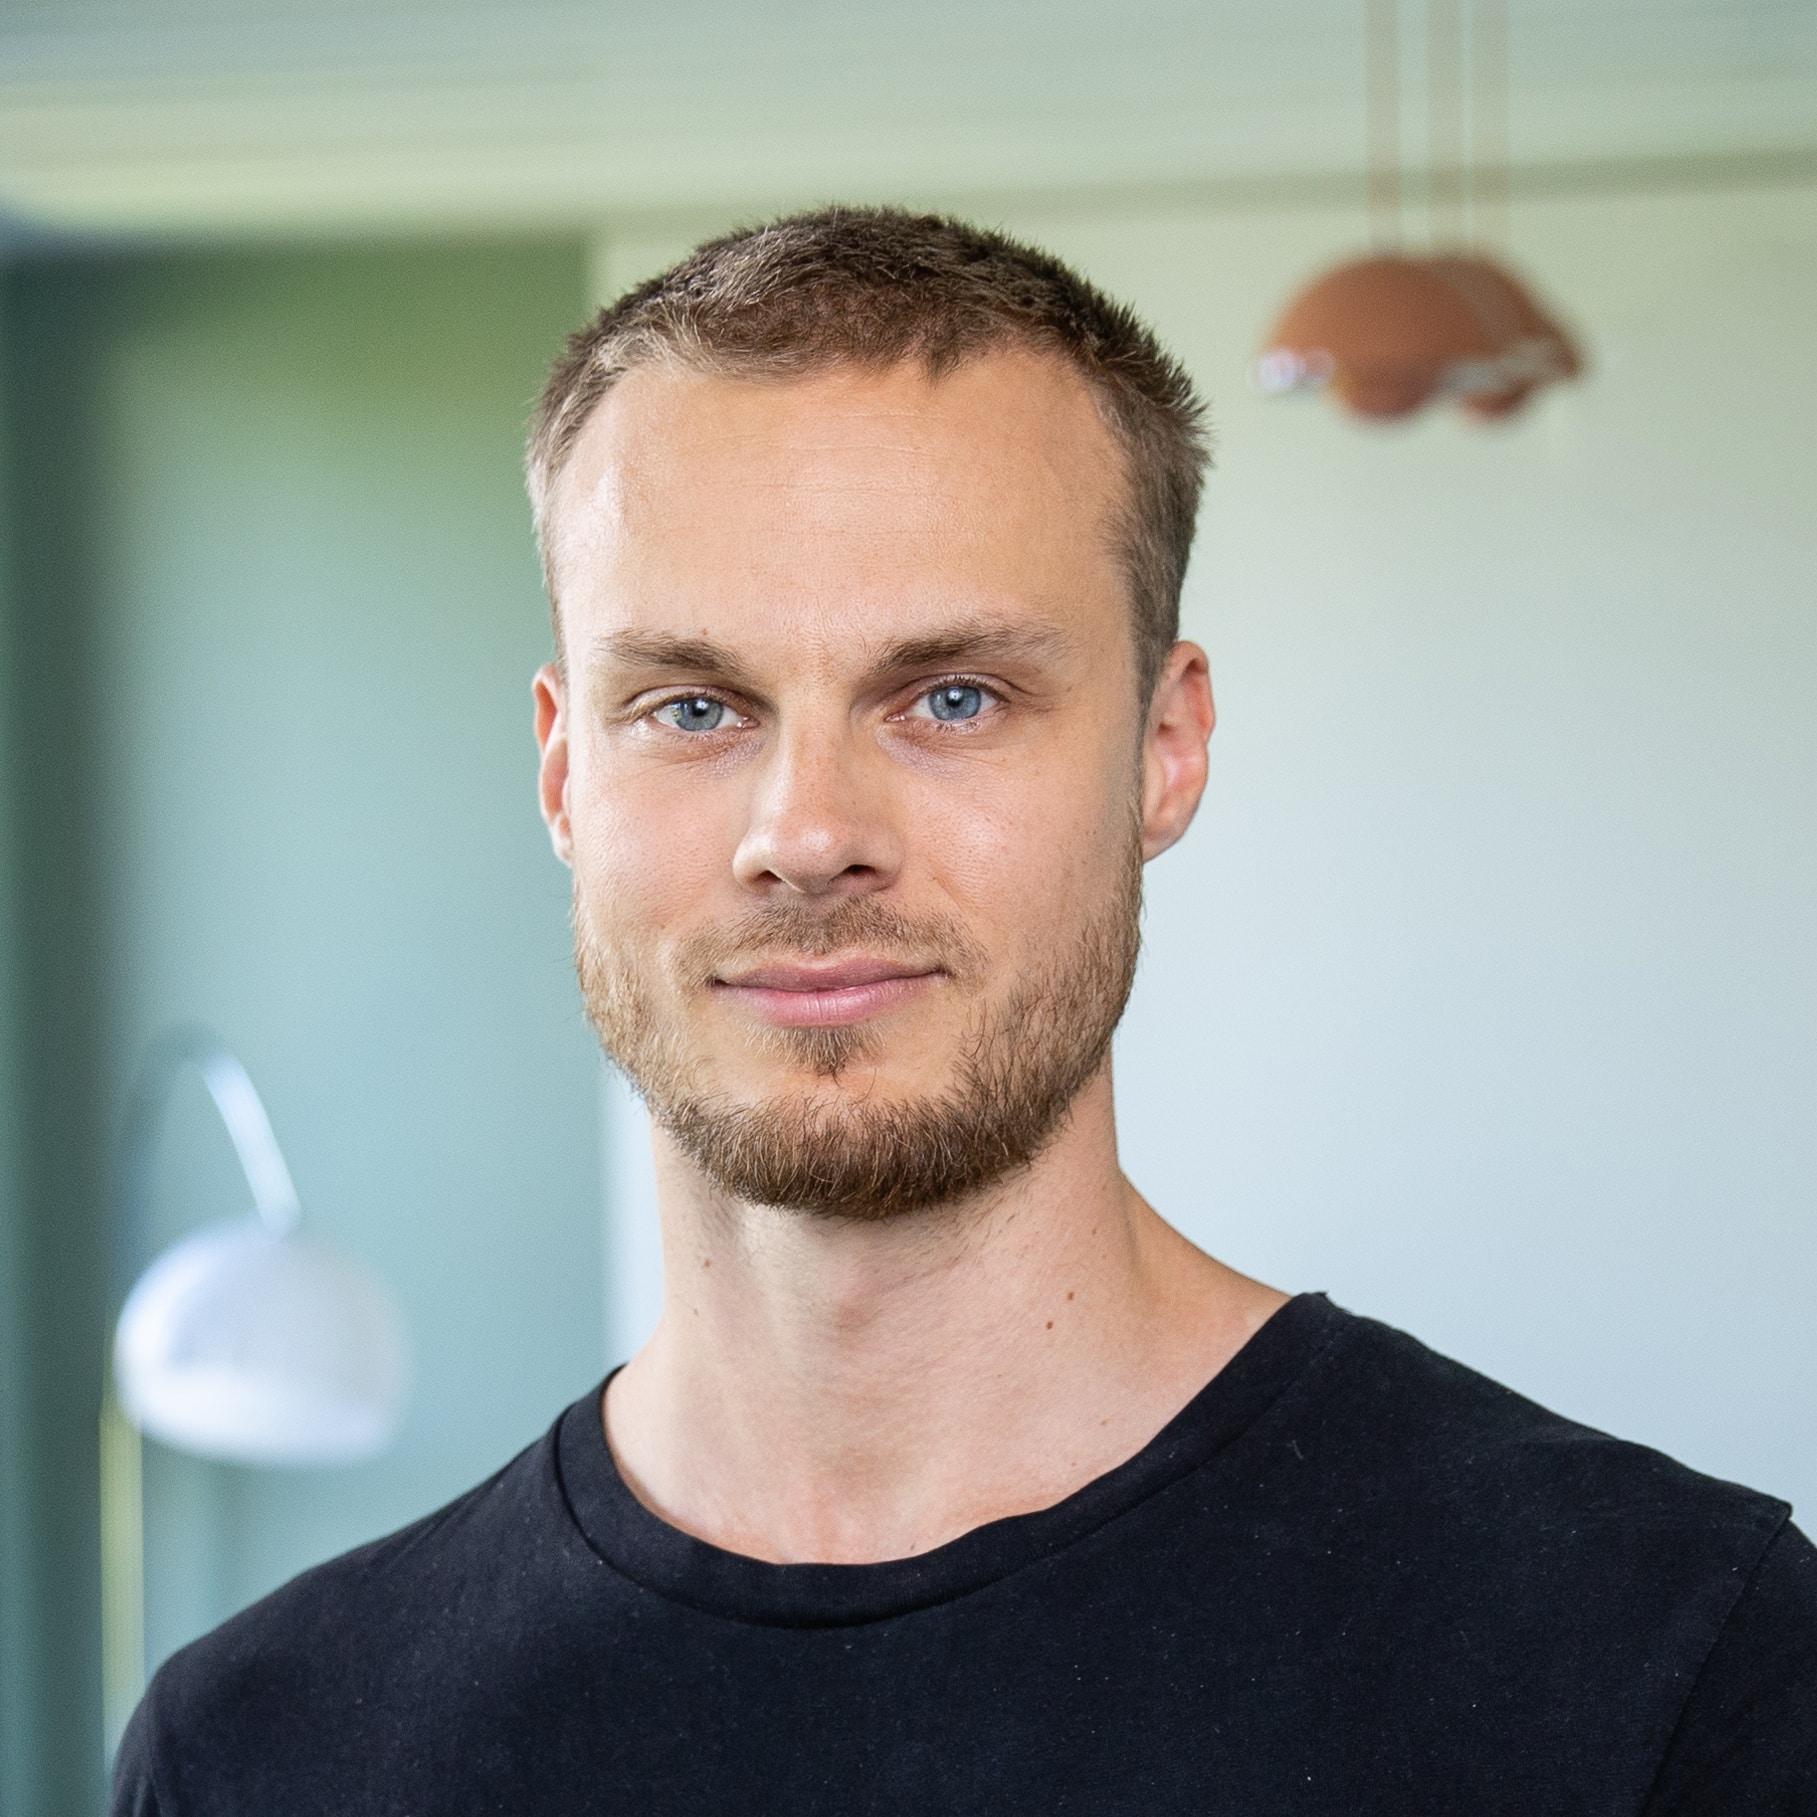 Marcus Österberg